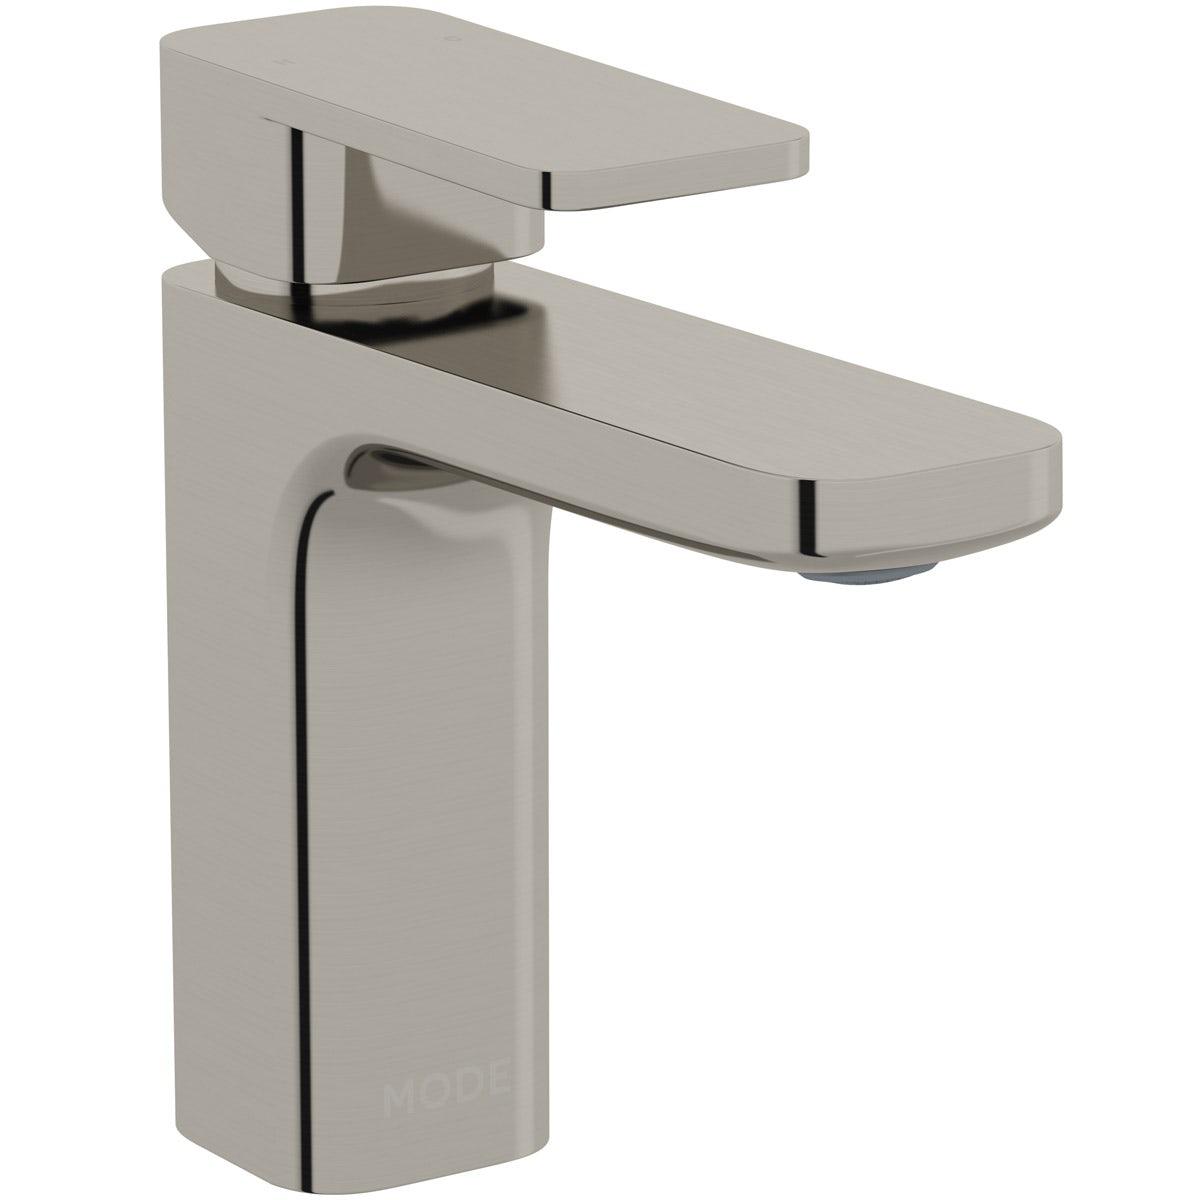 Mode Spencer square brushed nickel basin mixer tap